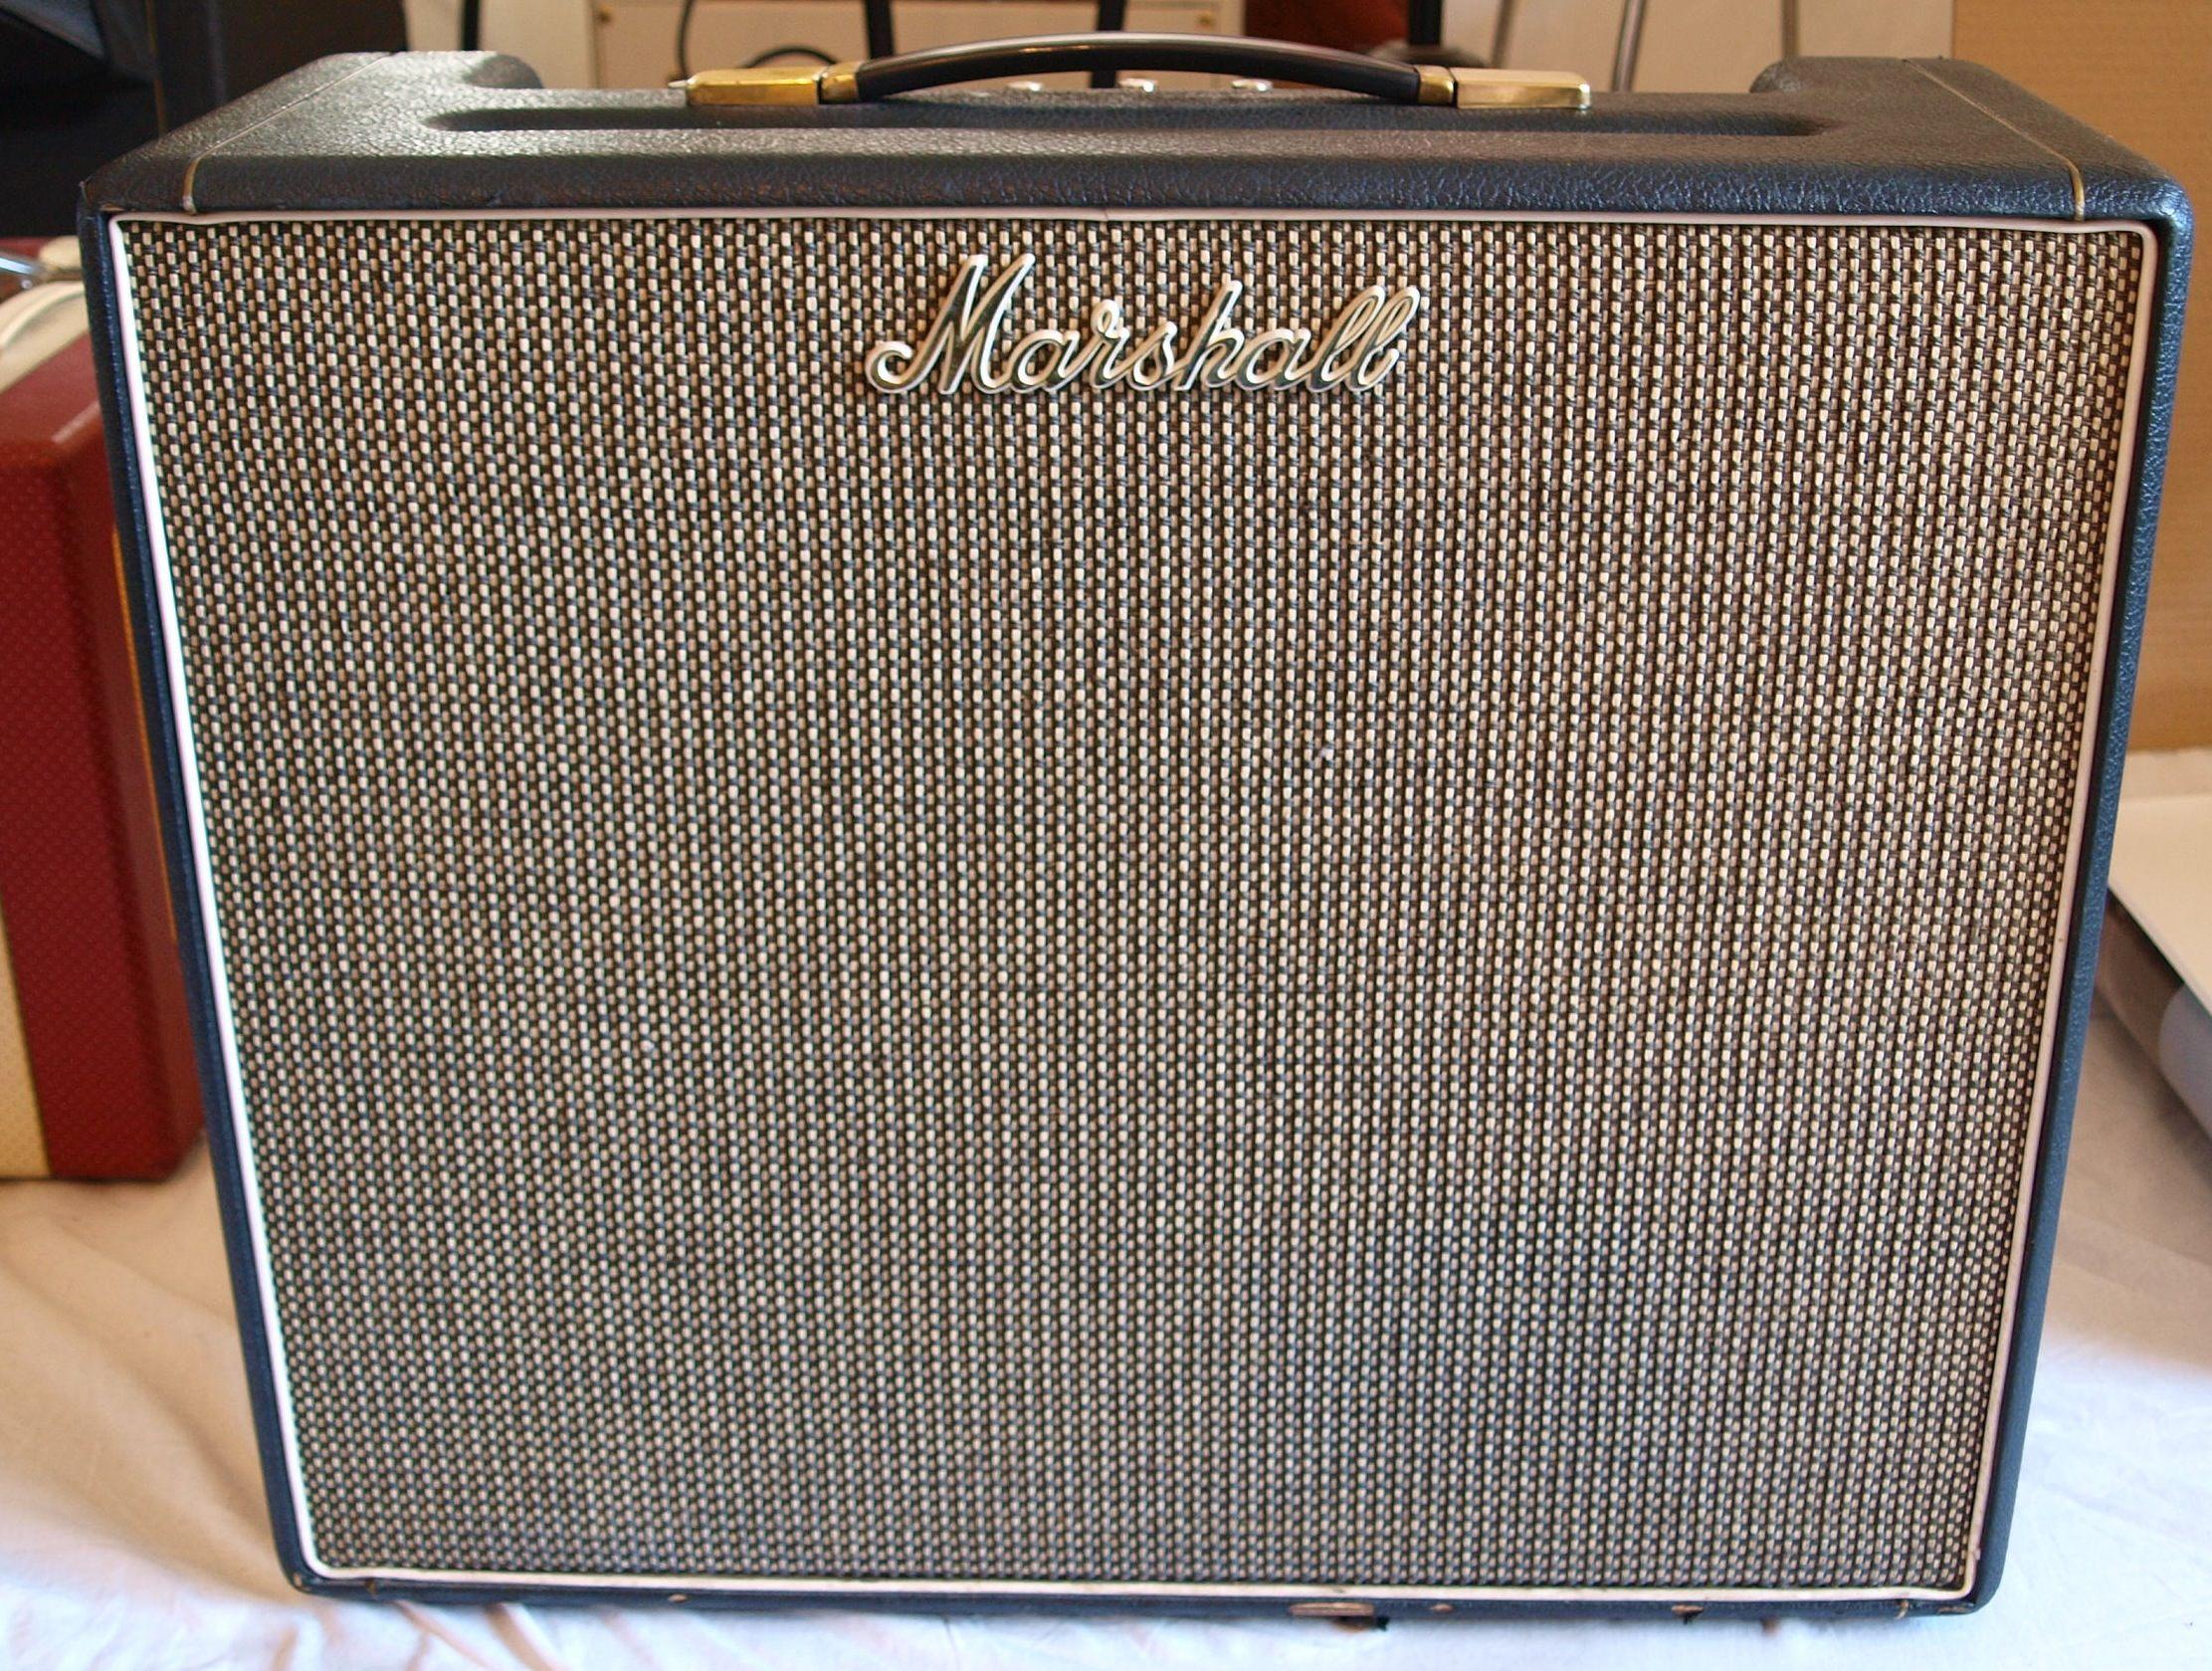 Marshall Combo 1969 Black Amp For Sale Guitaravenue Ltd